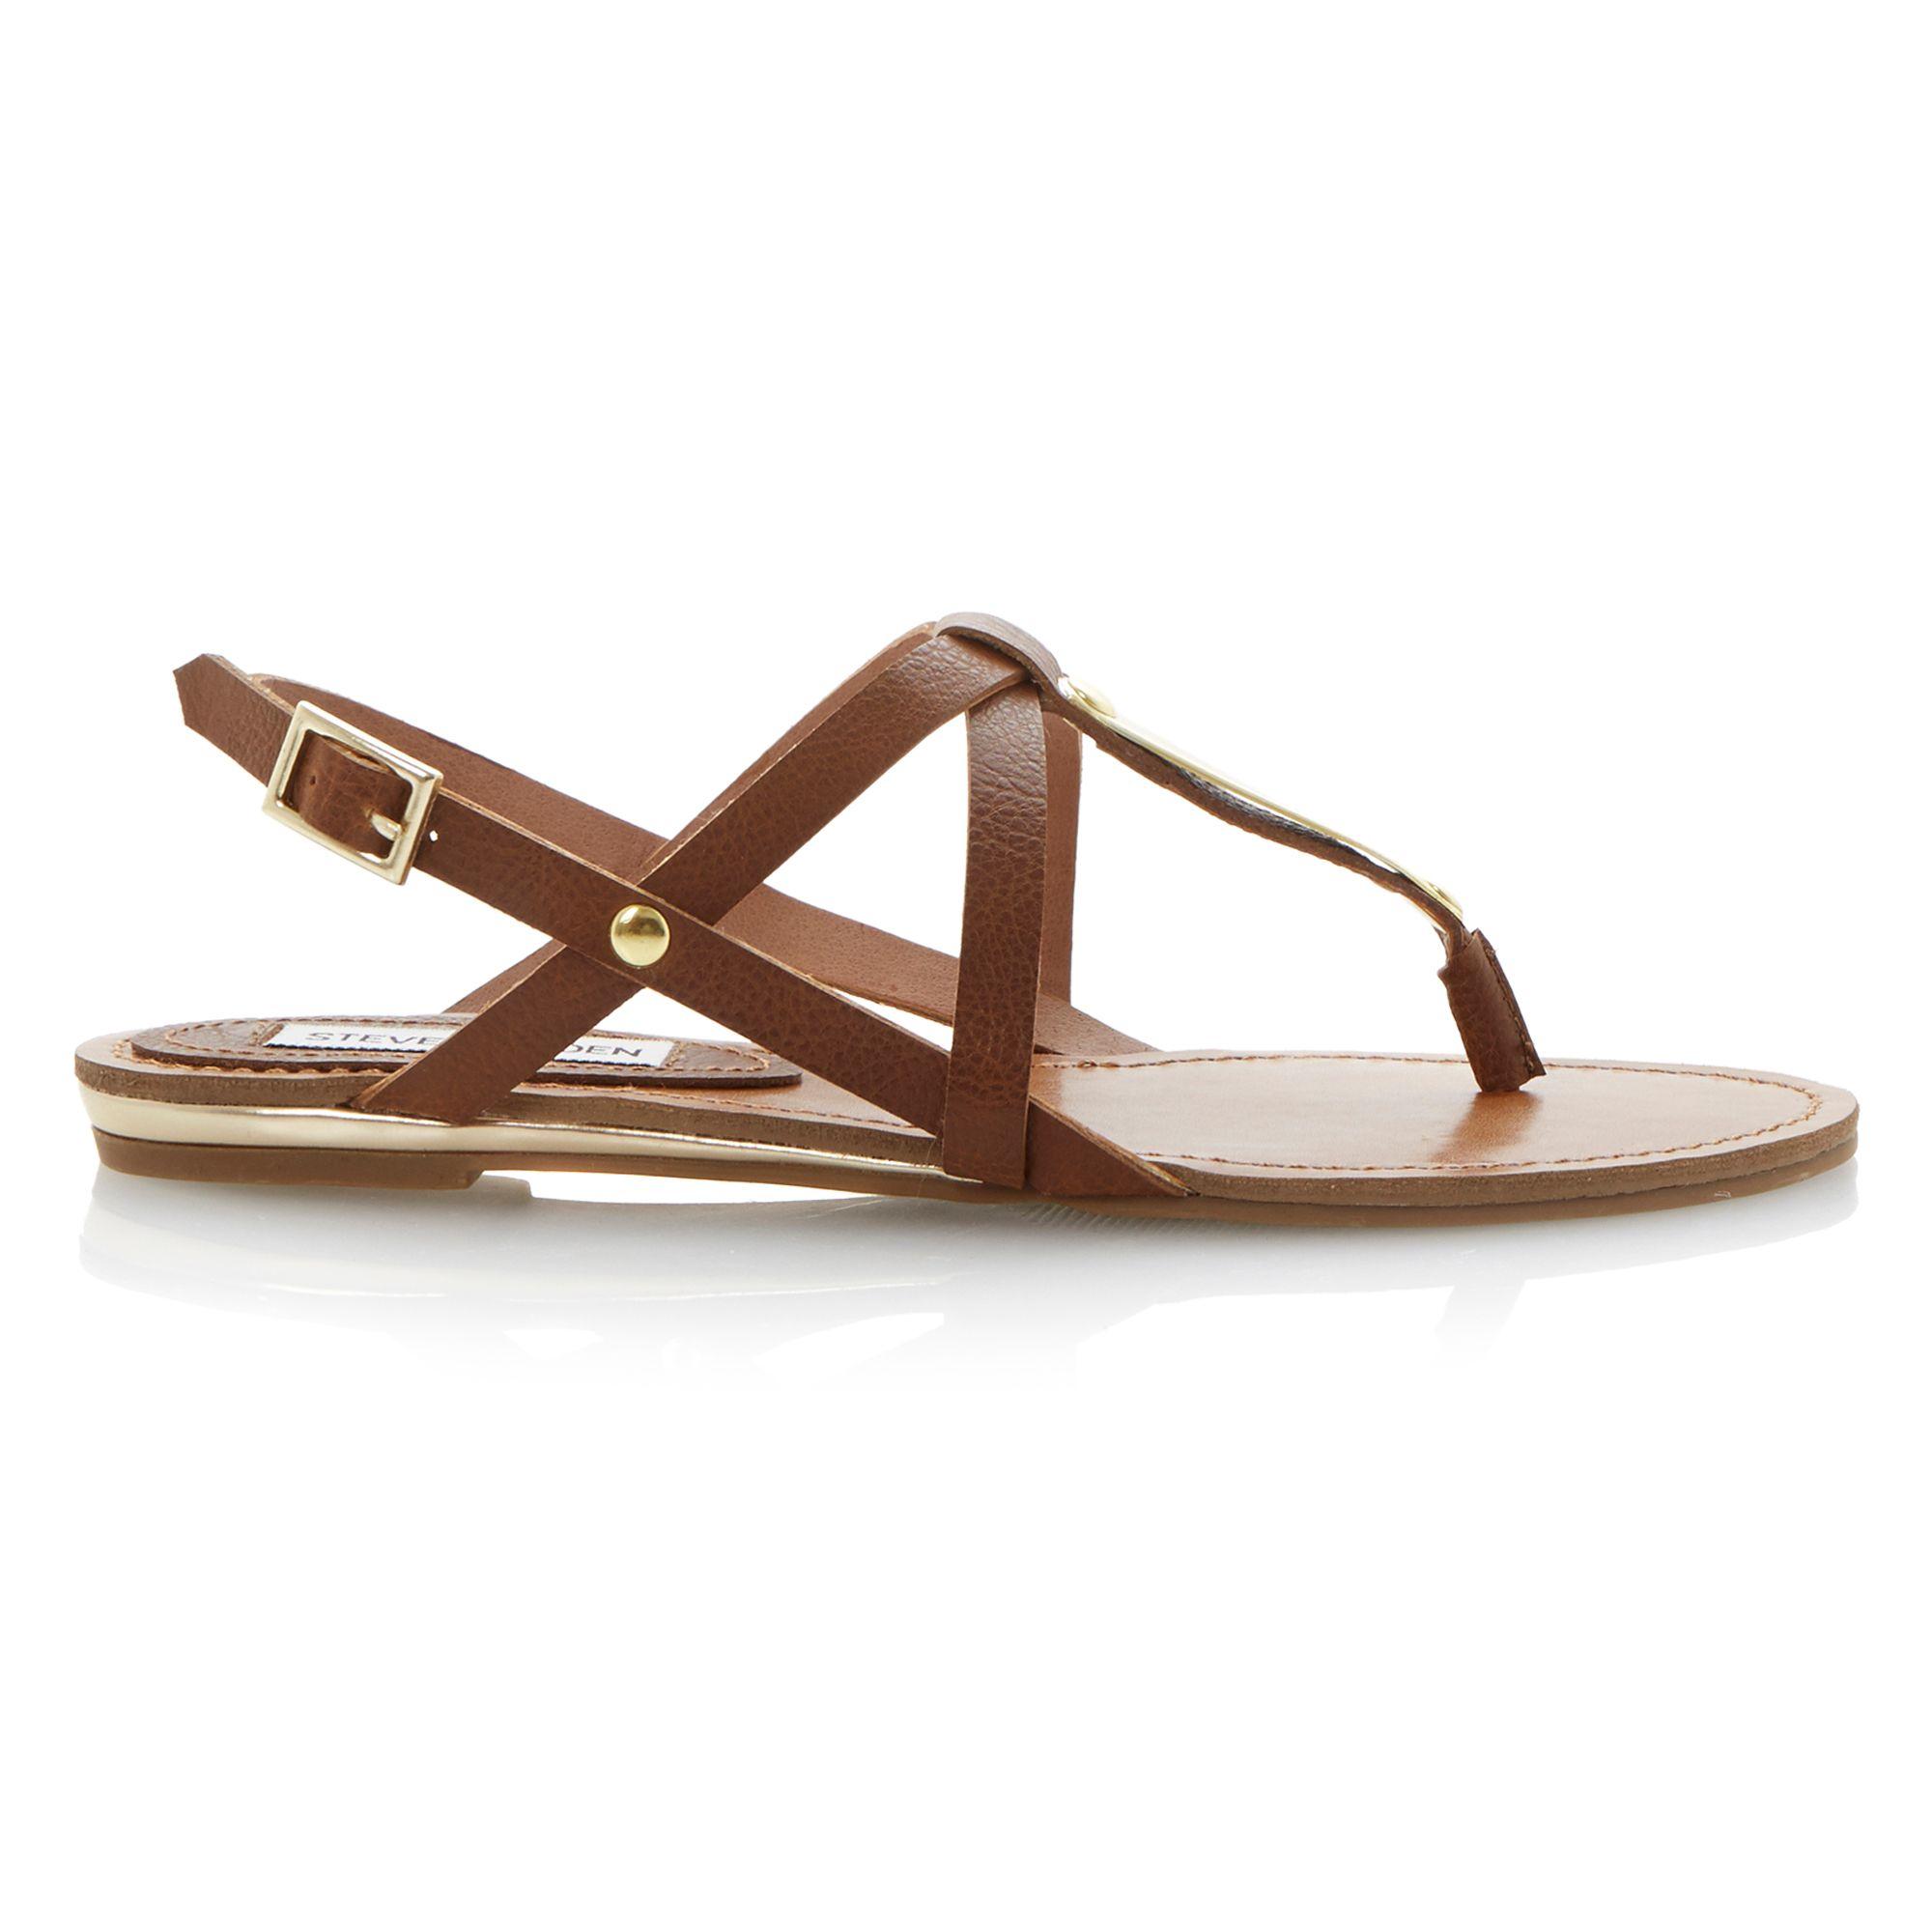 steve madden junyaa flat sandals in brown lyst. Black Bedroom Furniture Sets. Home Design Ideas